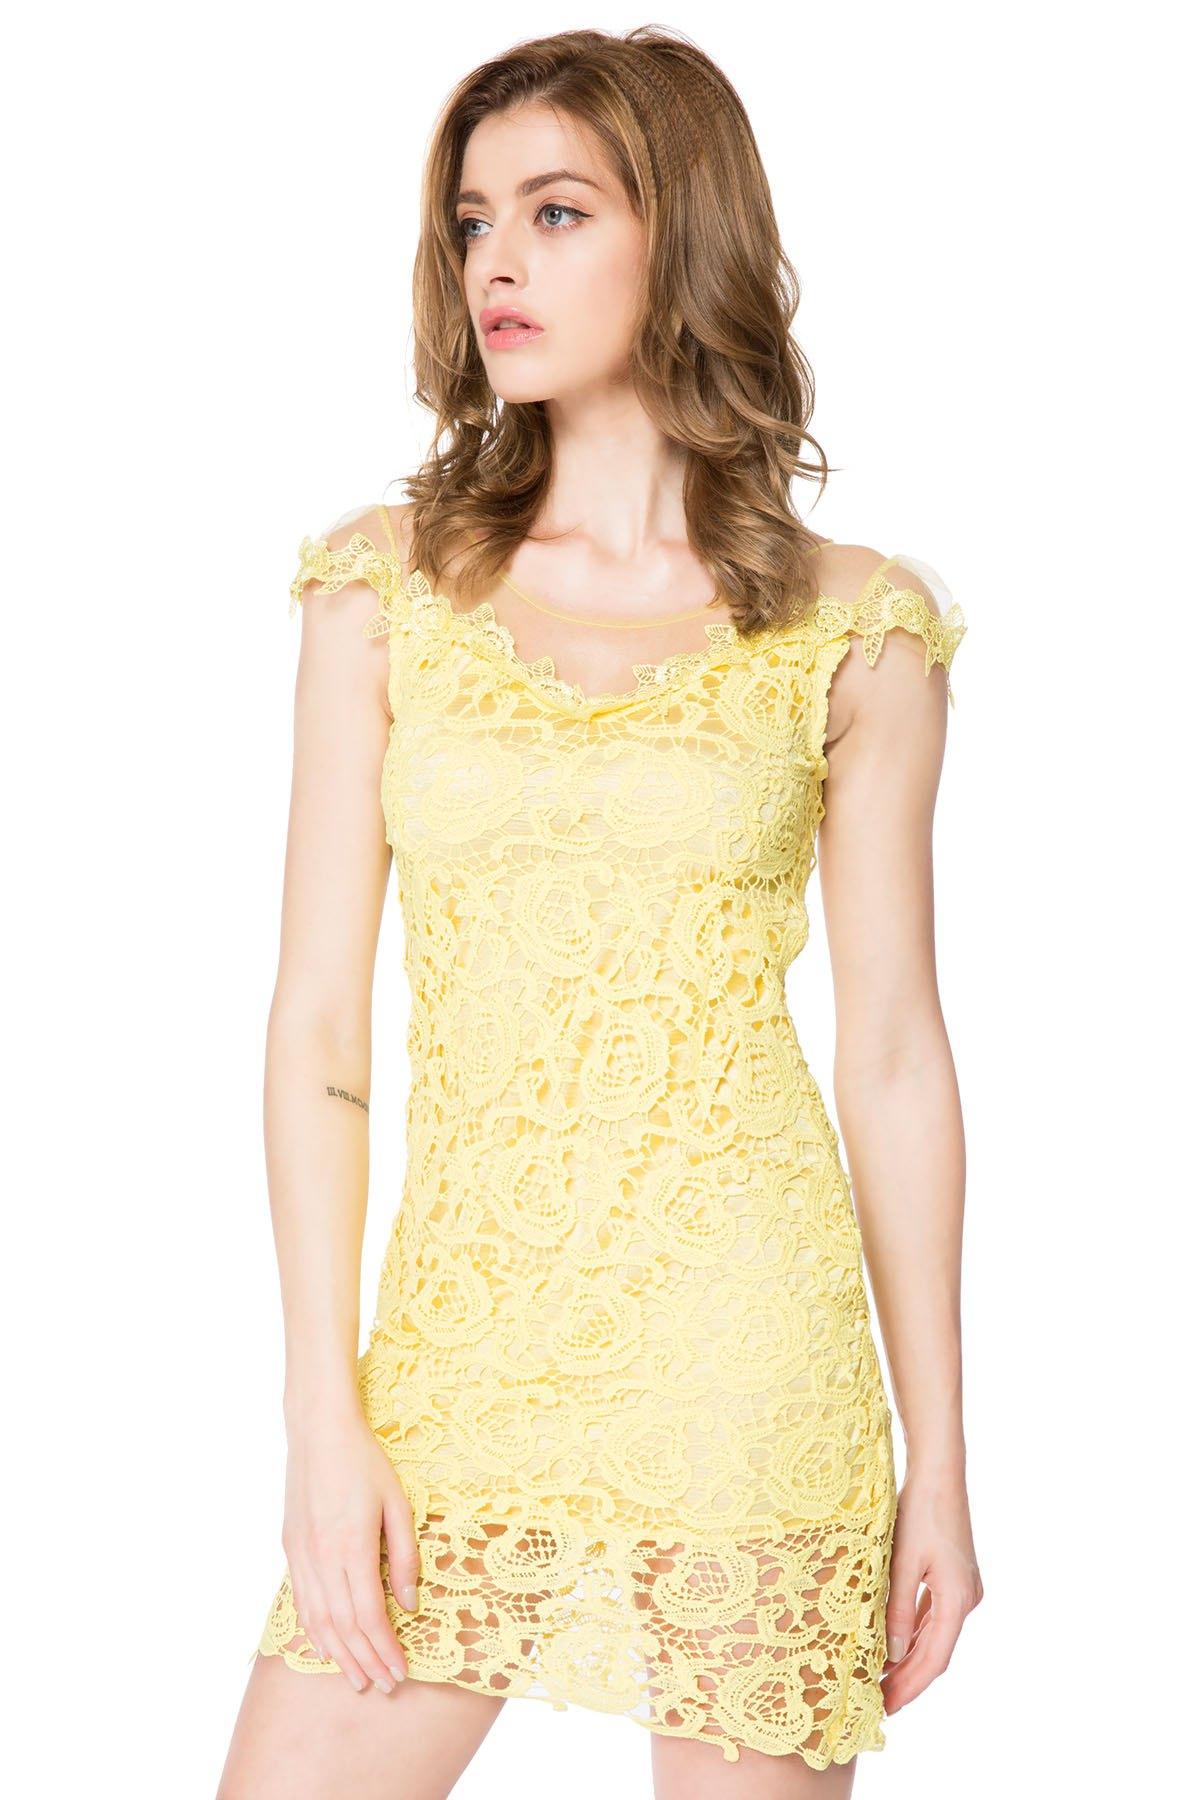 Vestido corto mujer amarilla por solo 5.18 EUR